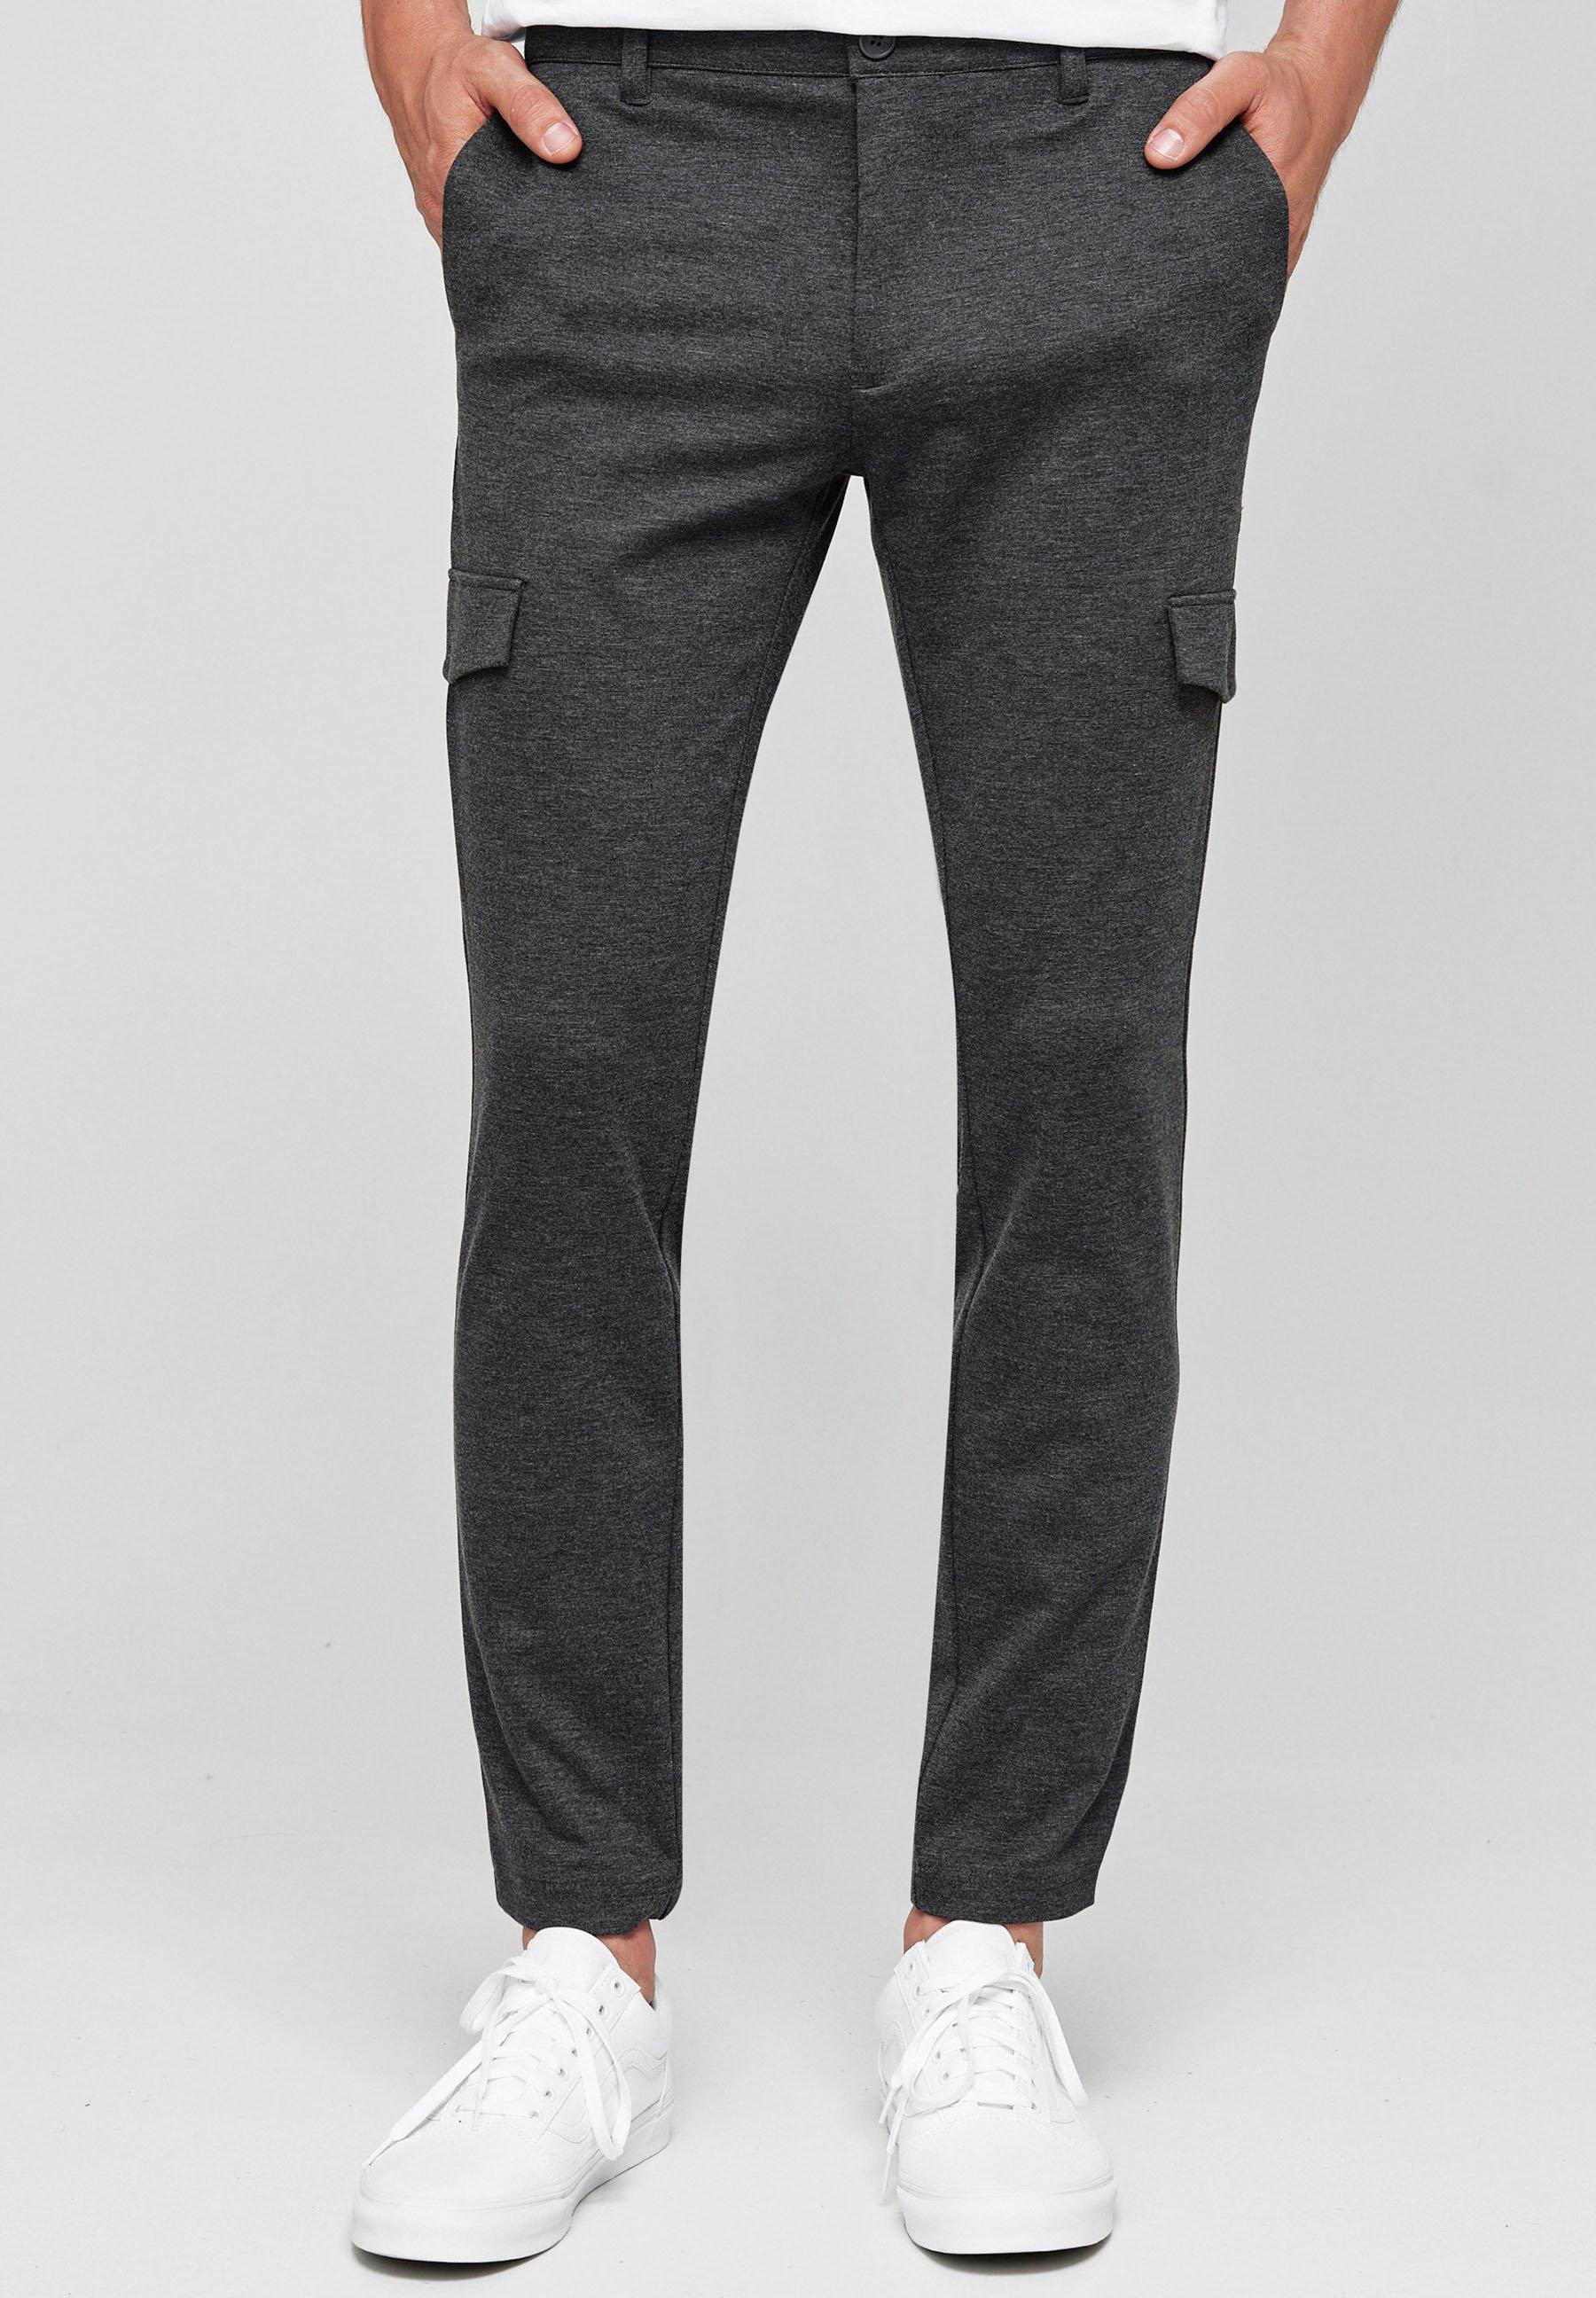 Homme SUPER STRETCH ECKHART - Pantalon cargo